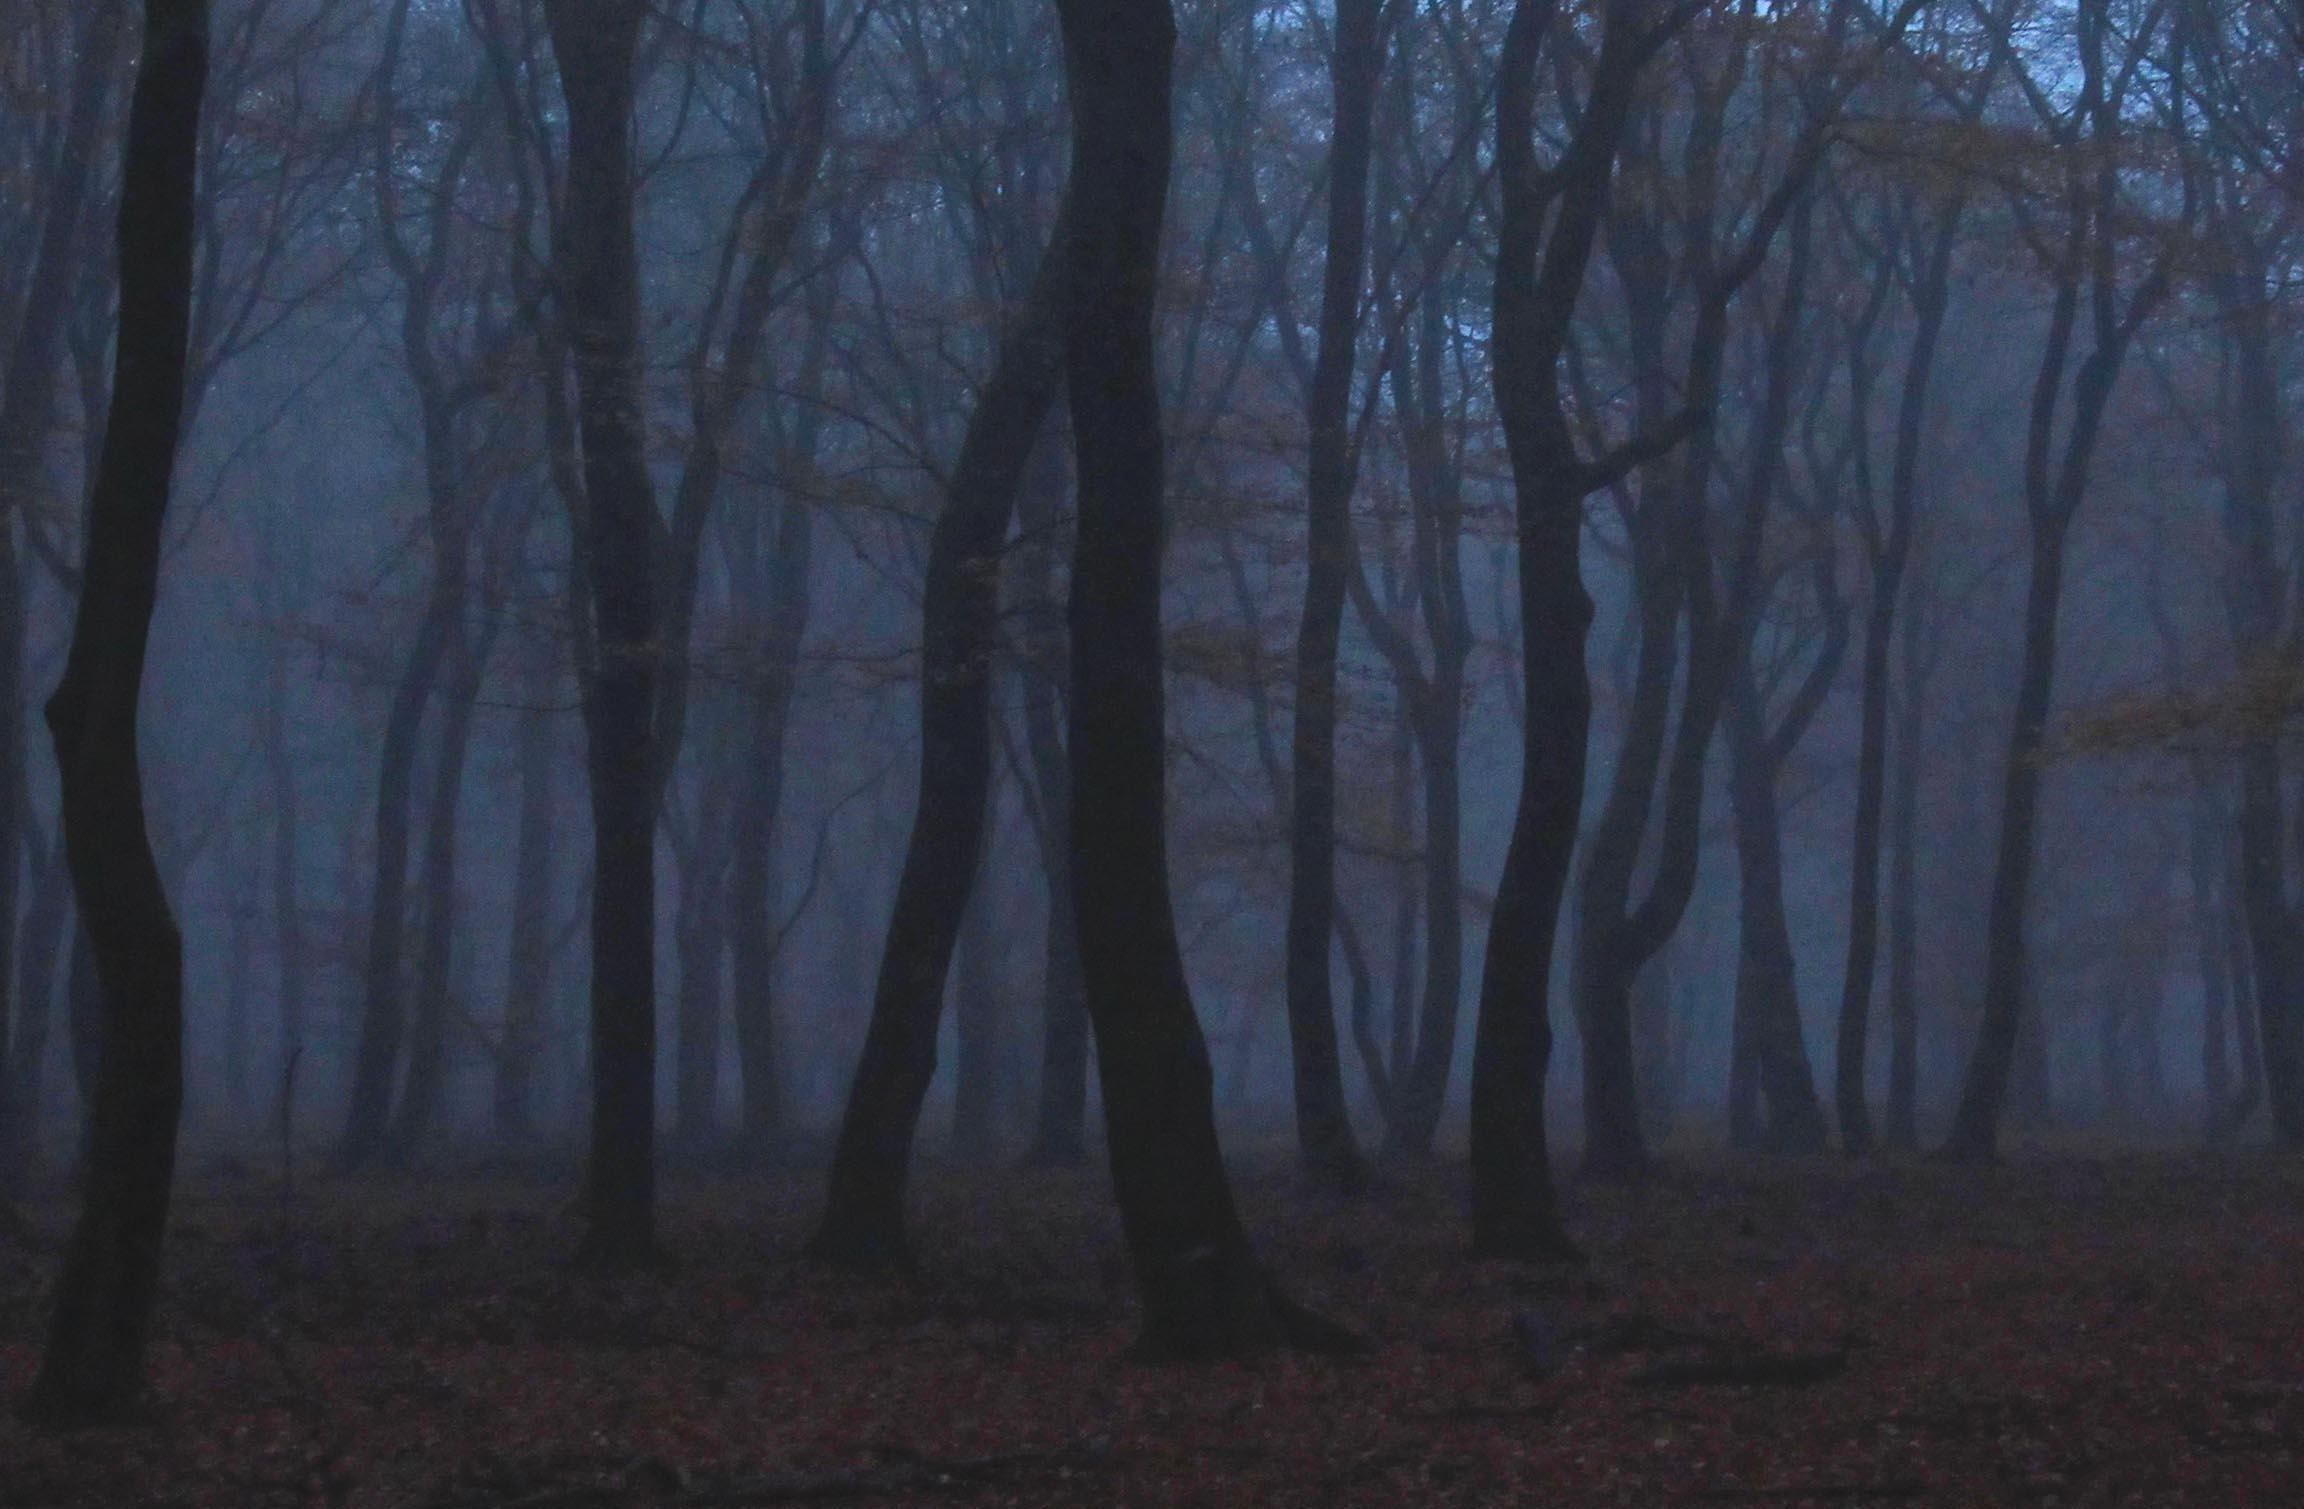 Tegen de avond kwam er mist opzetten in het oude beukenbos - Foto's: ©Louis Fraanje